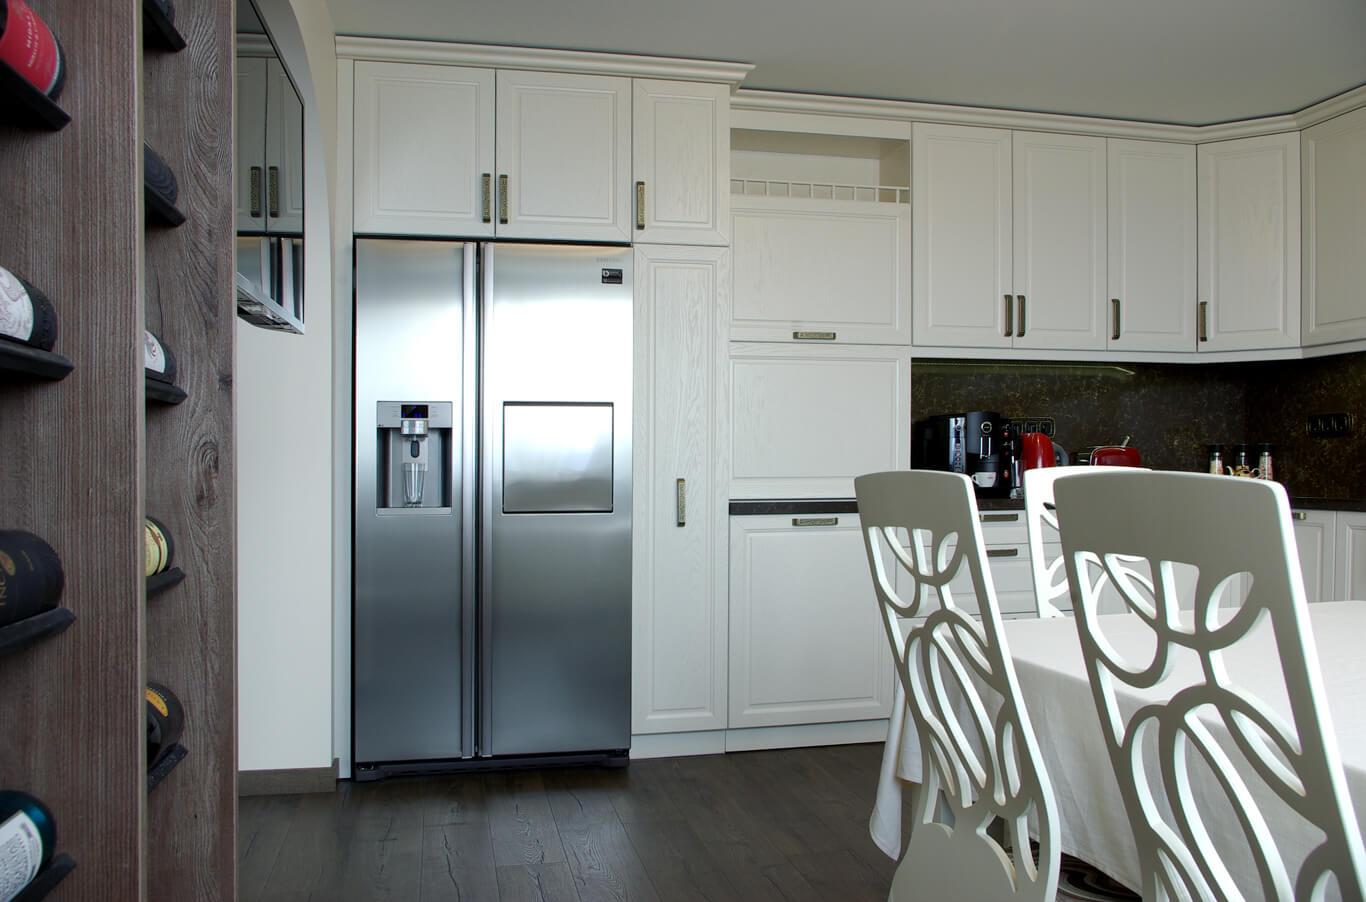 бодилукс голяма кухня с голям хладилник